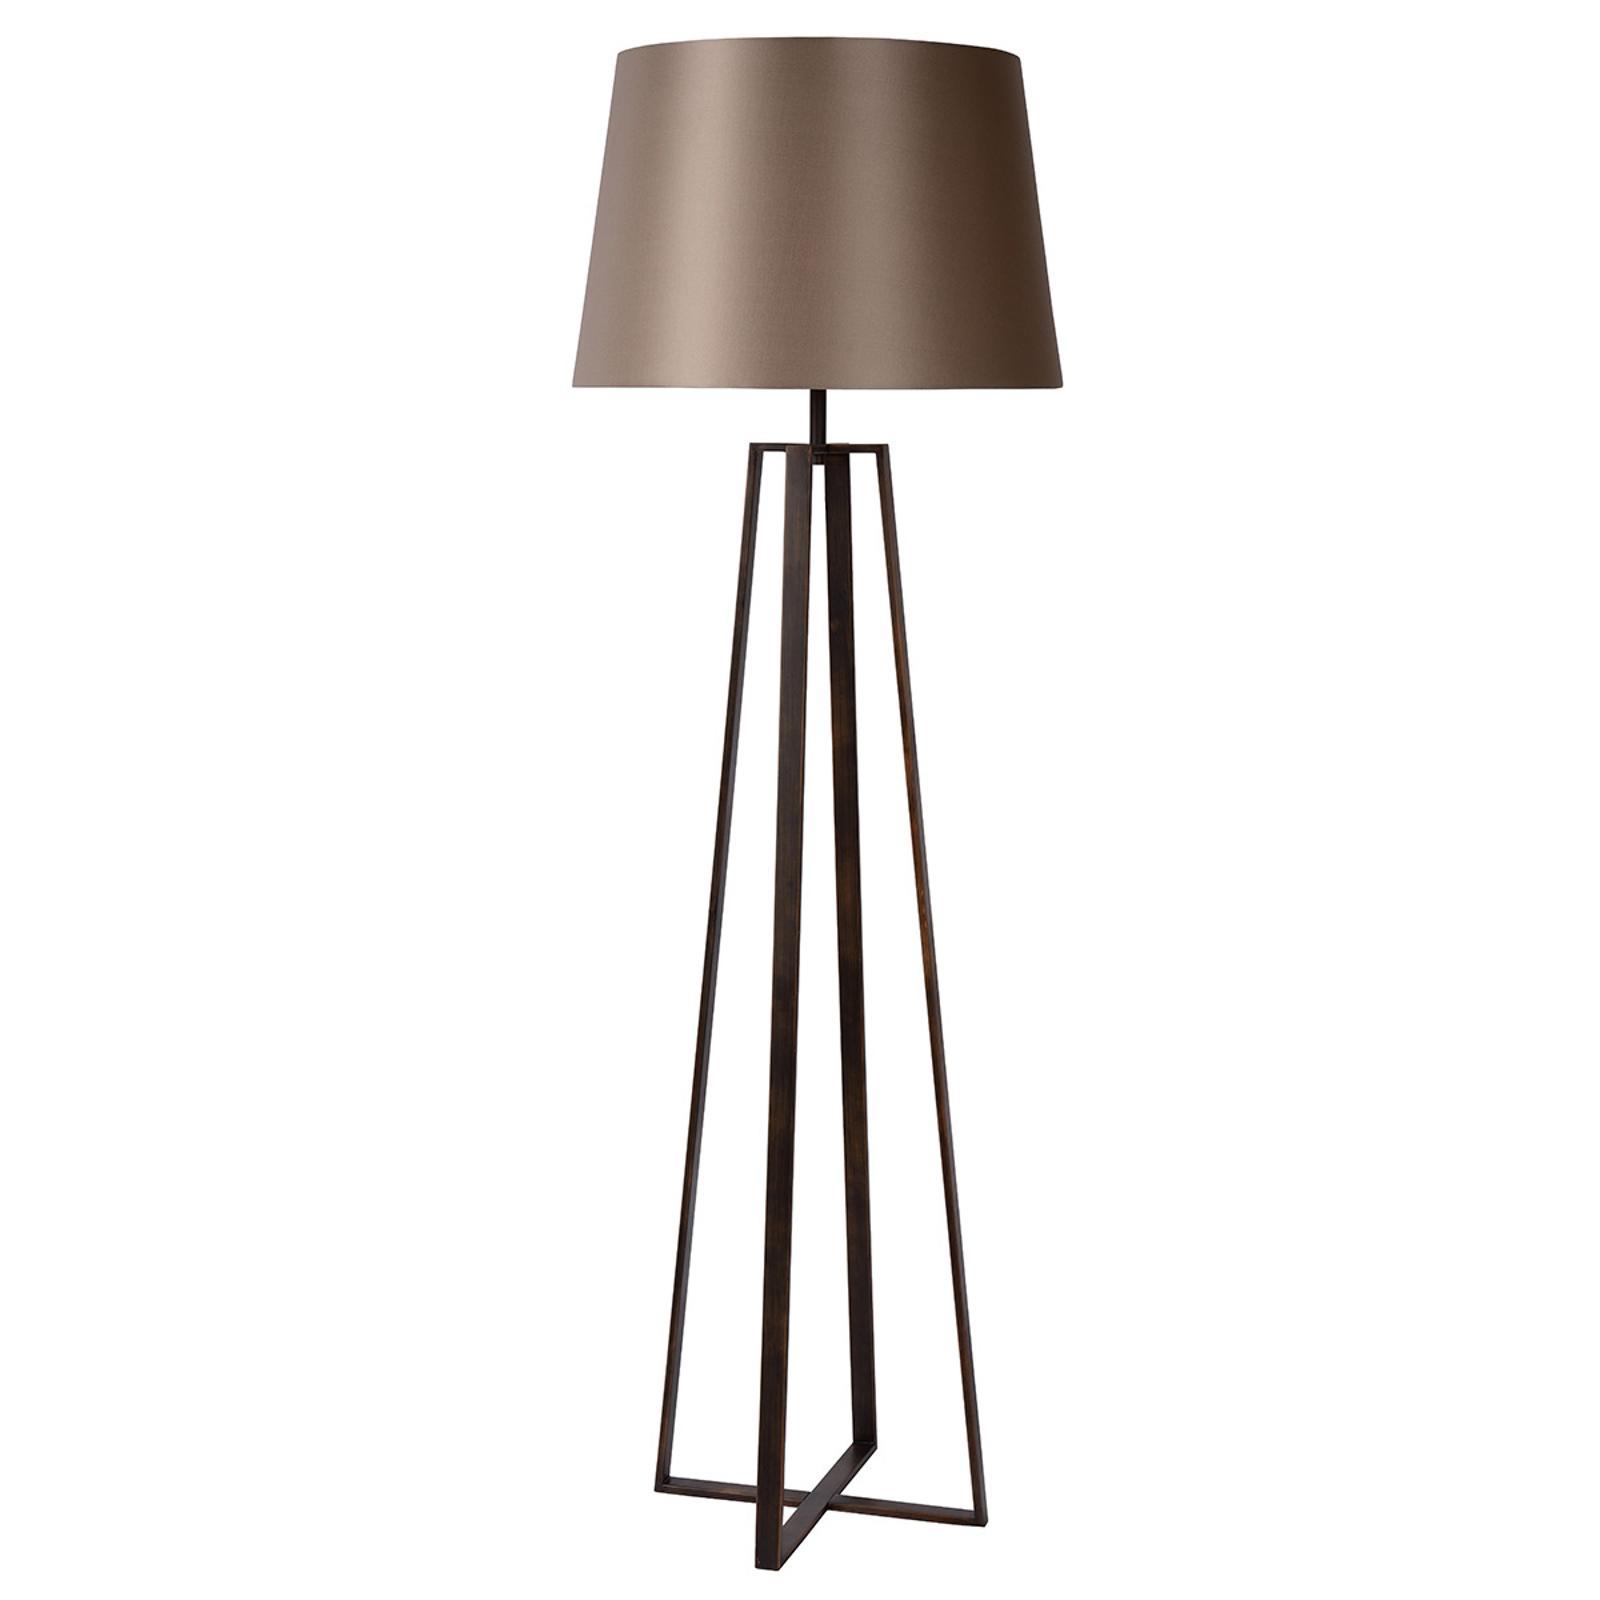 Lattiavalaisin Coffee Lamp kangasvarjostimella